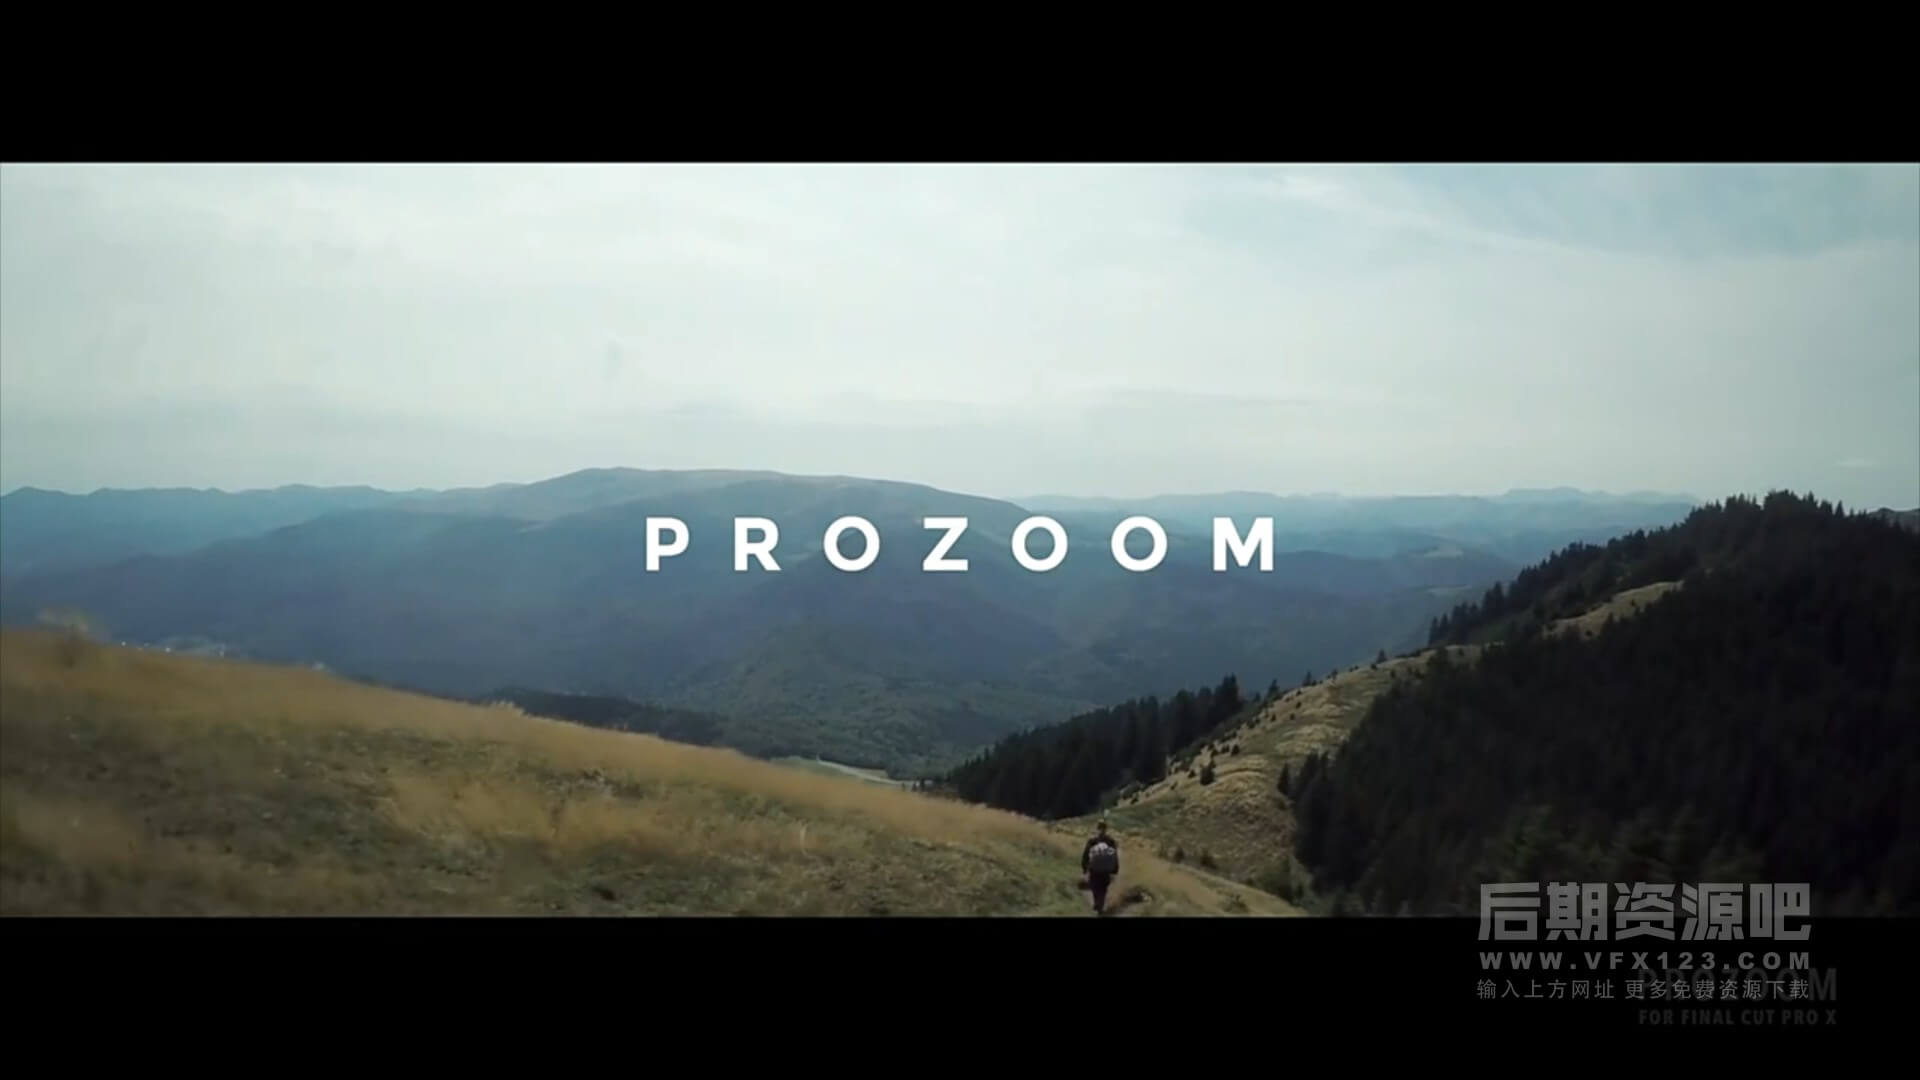 fcpx插件 画面局部平滑缩放平移旋转工具 4种时长预设 ProZoom